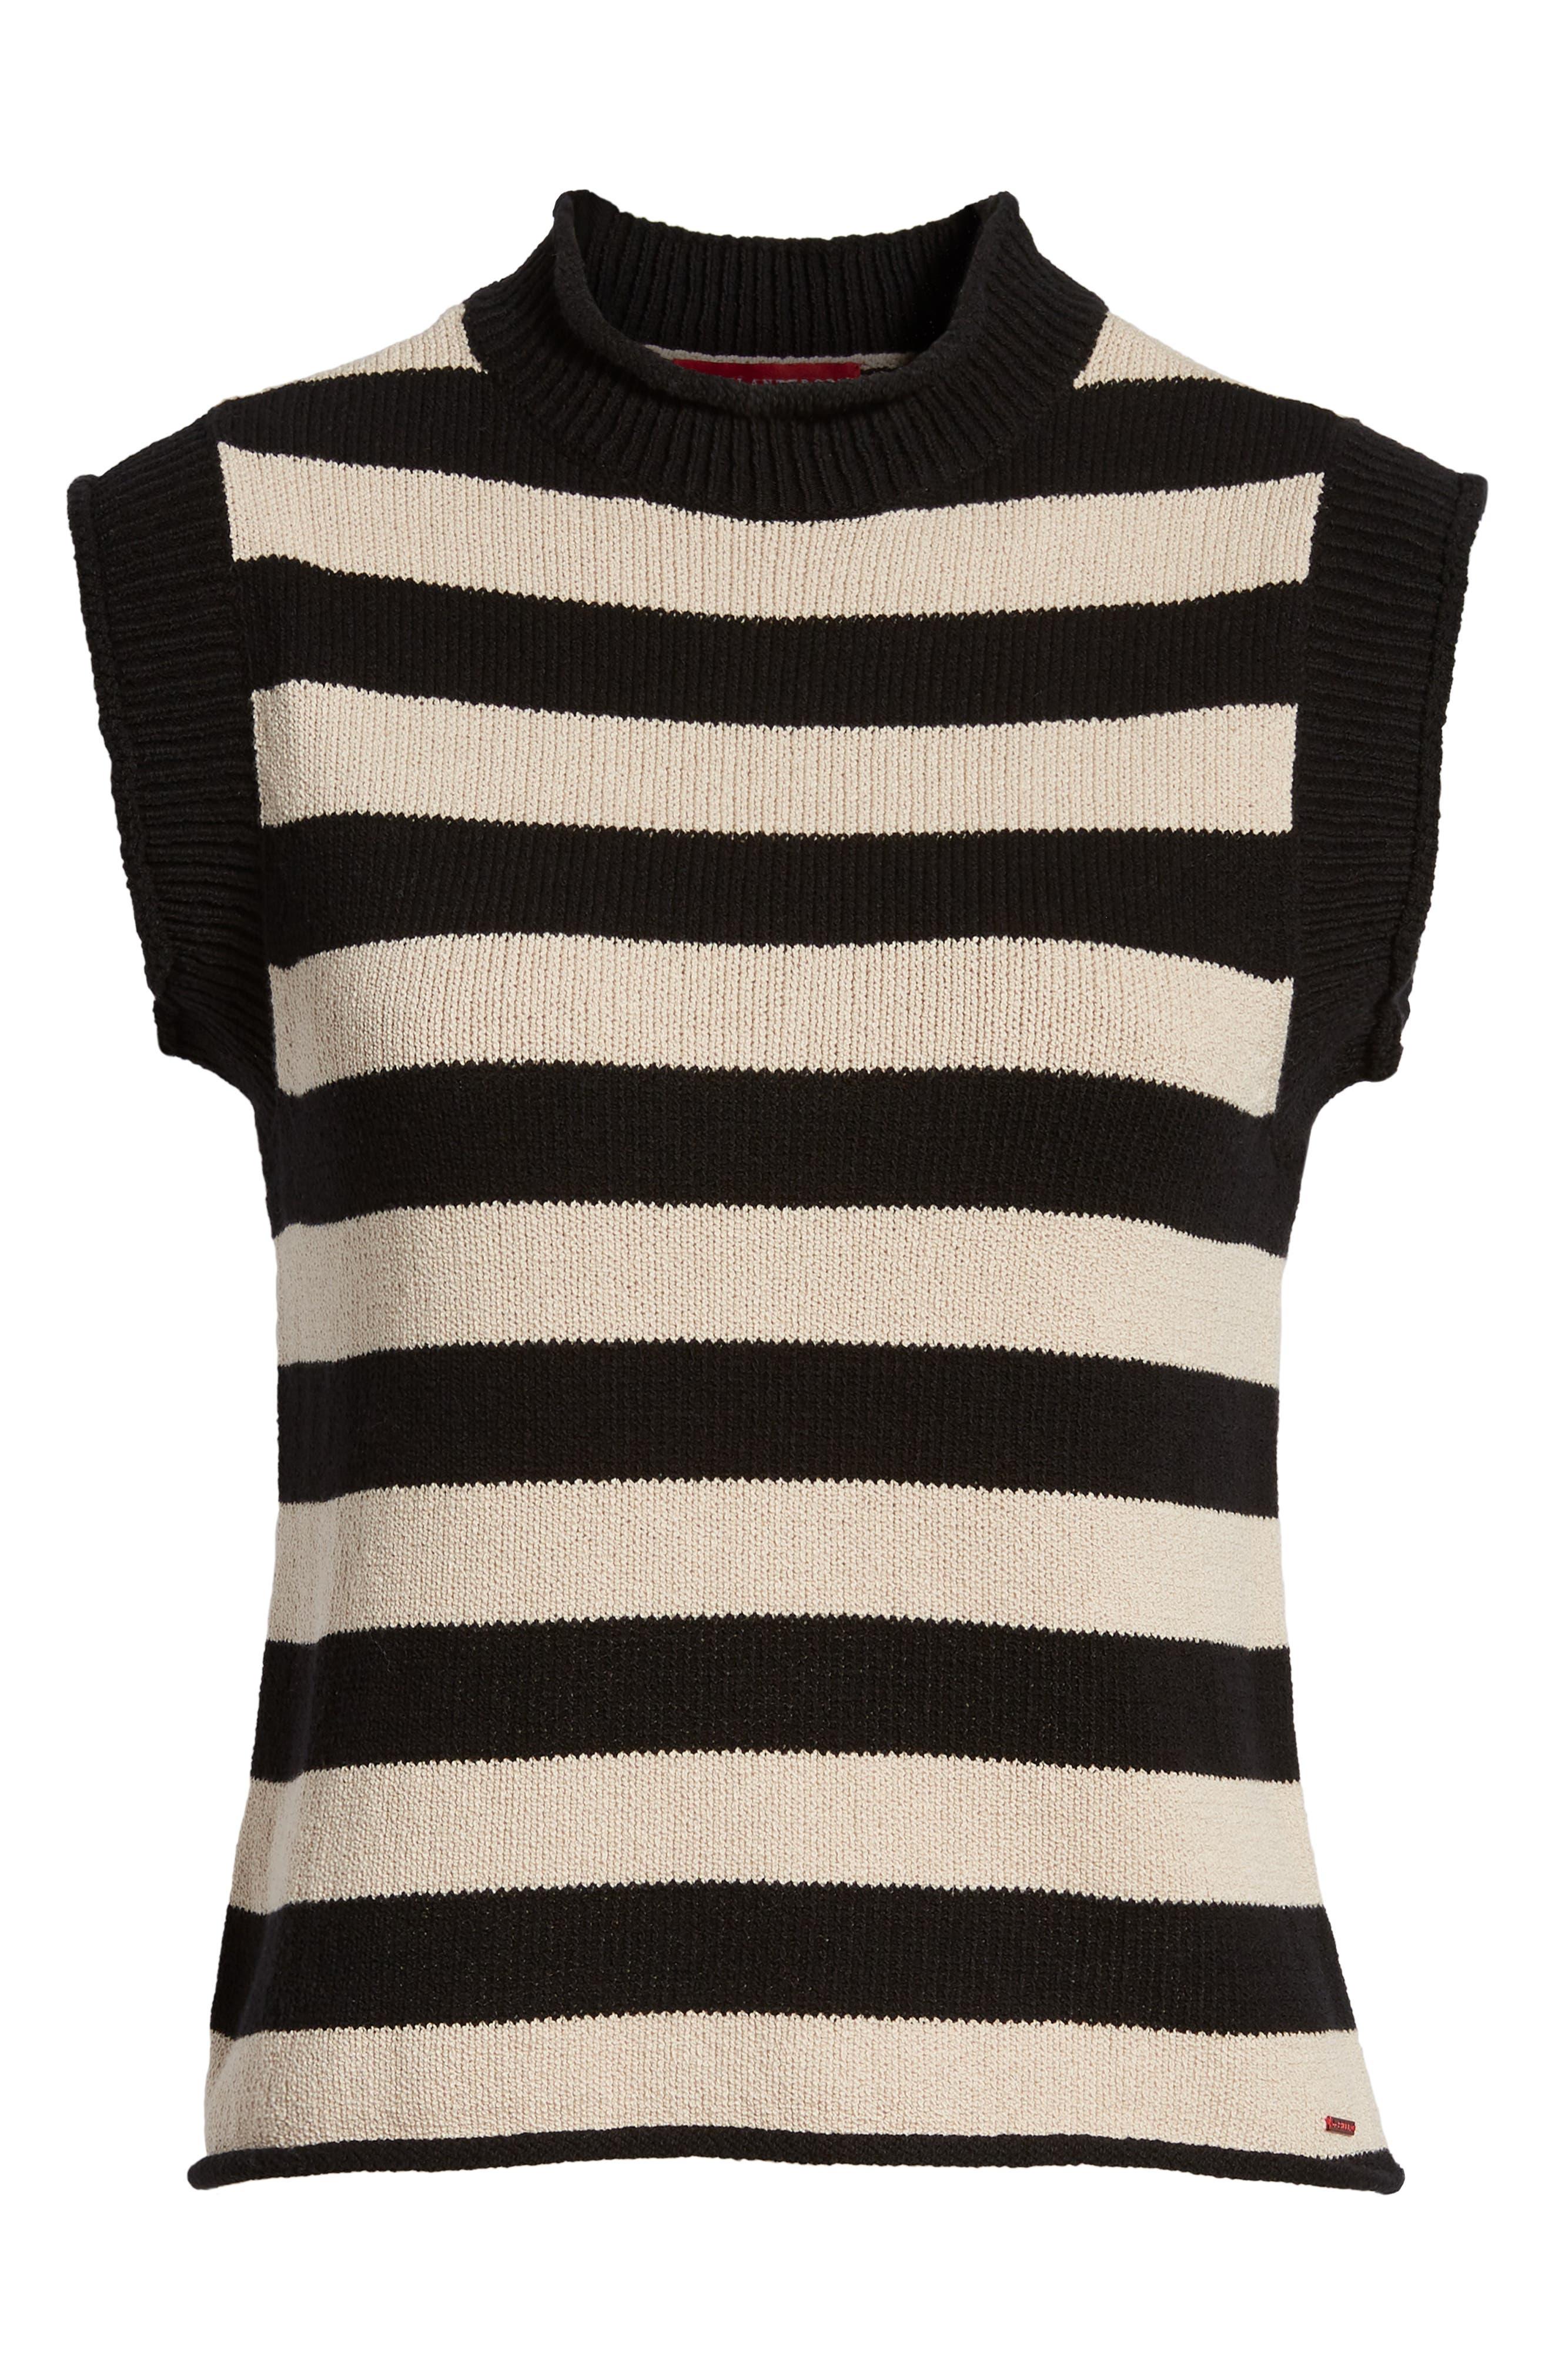 Tenny Stripe Sleeveless Sweater,                             Alternate thumbnail 6, color,                             BLACK CAT / AUTUMN STRIPE